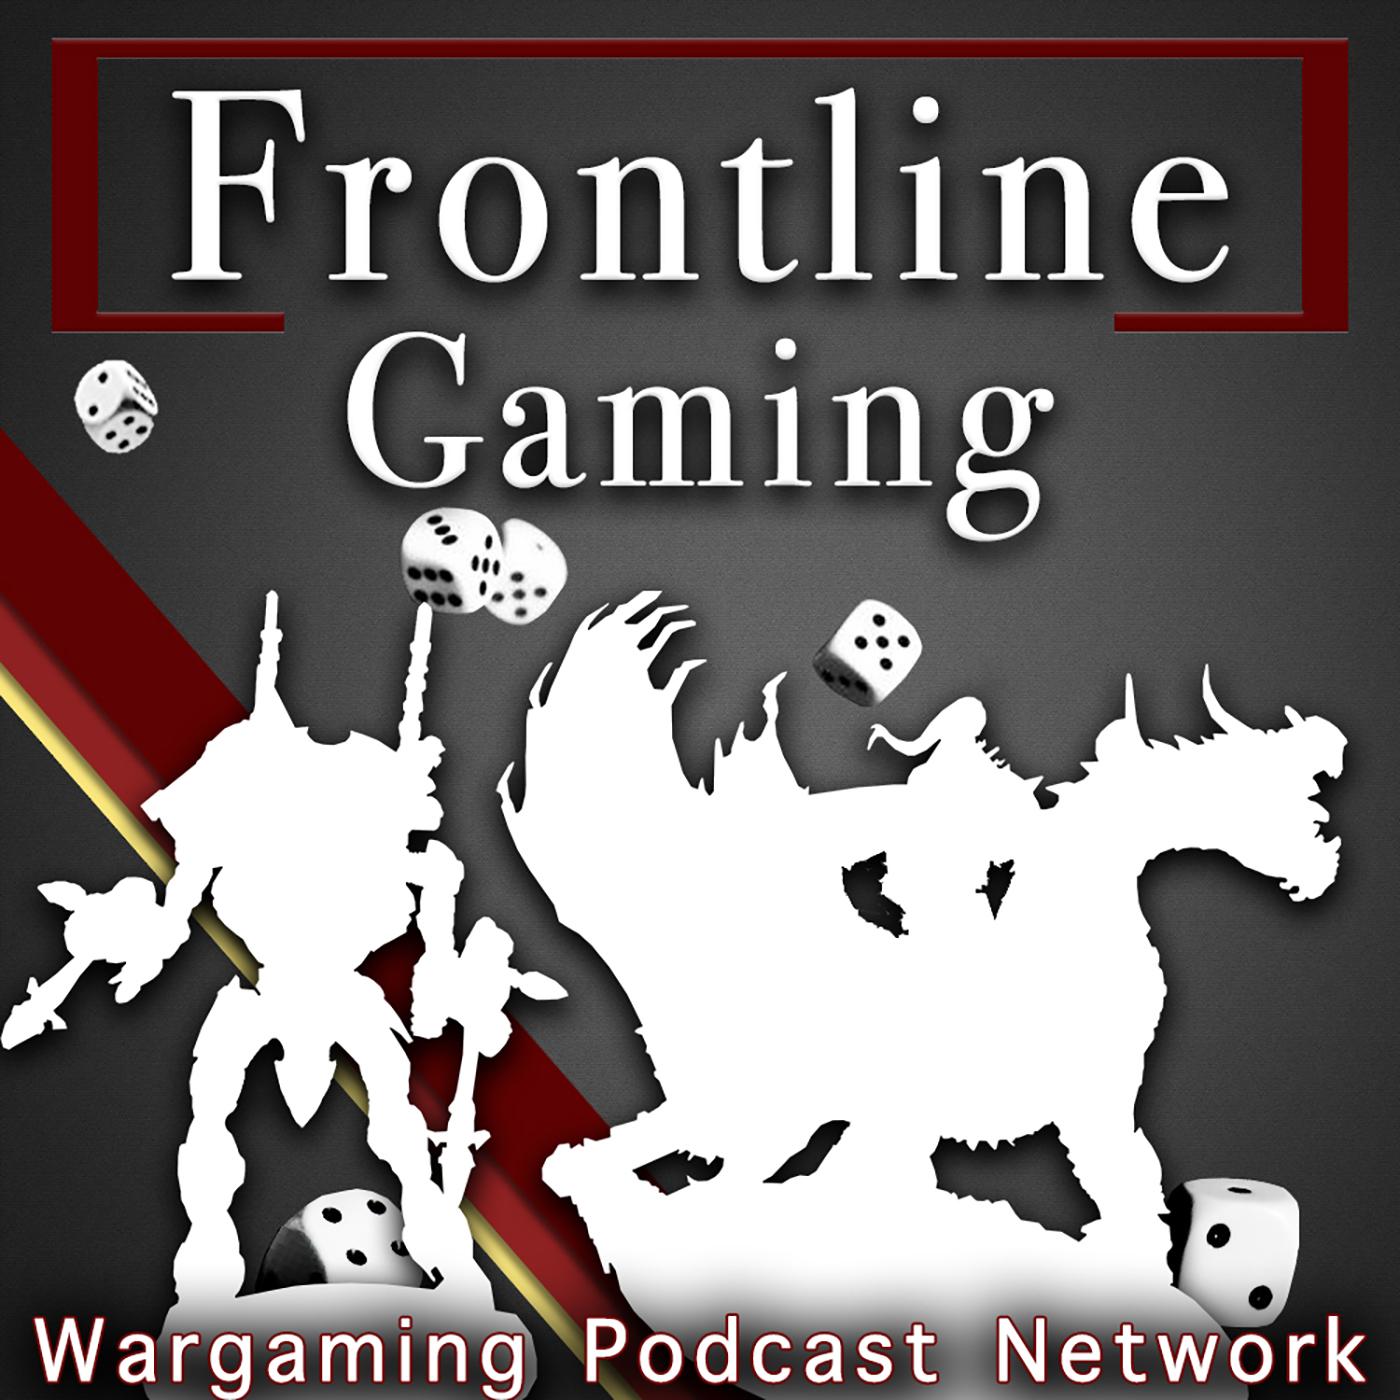 Frontline Gaming Network